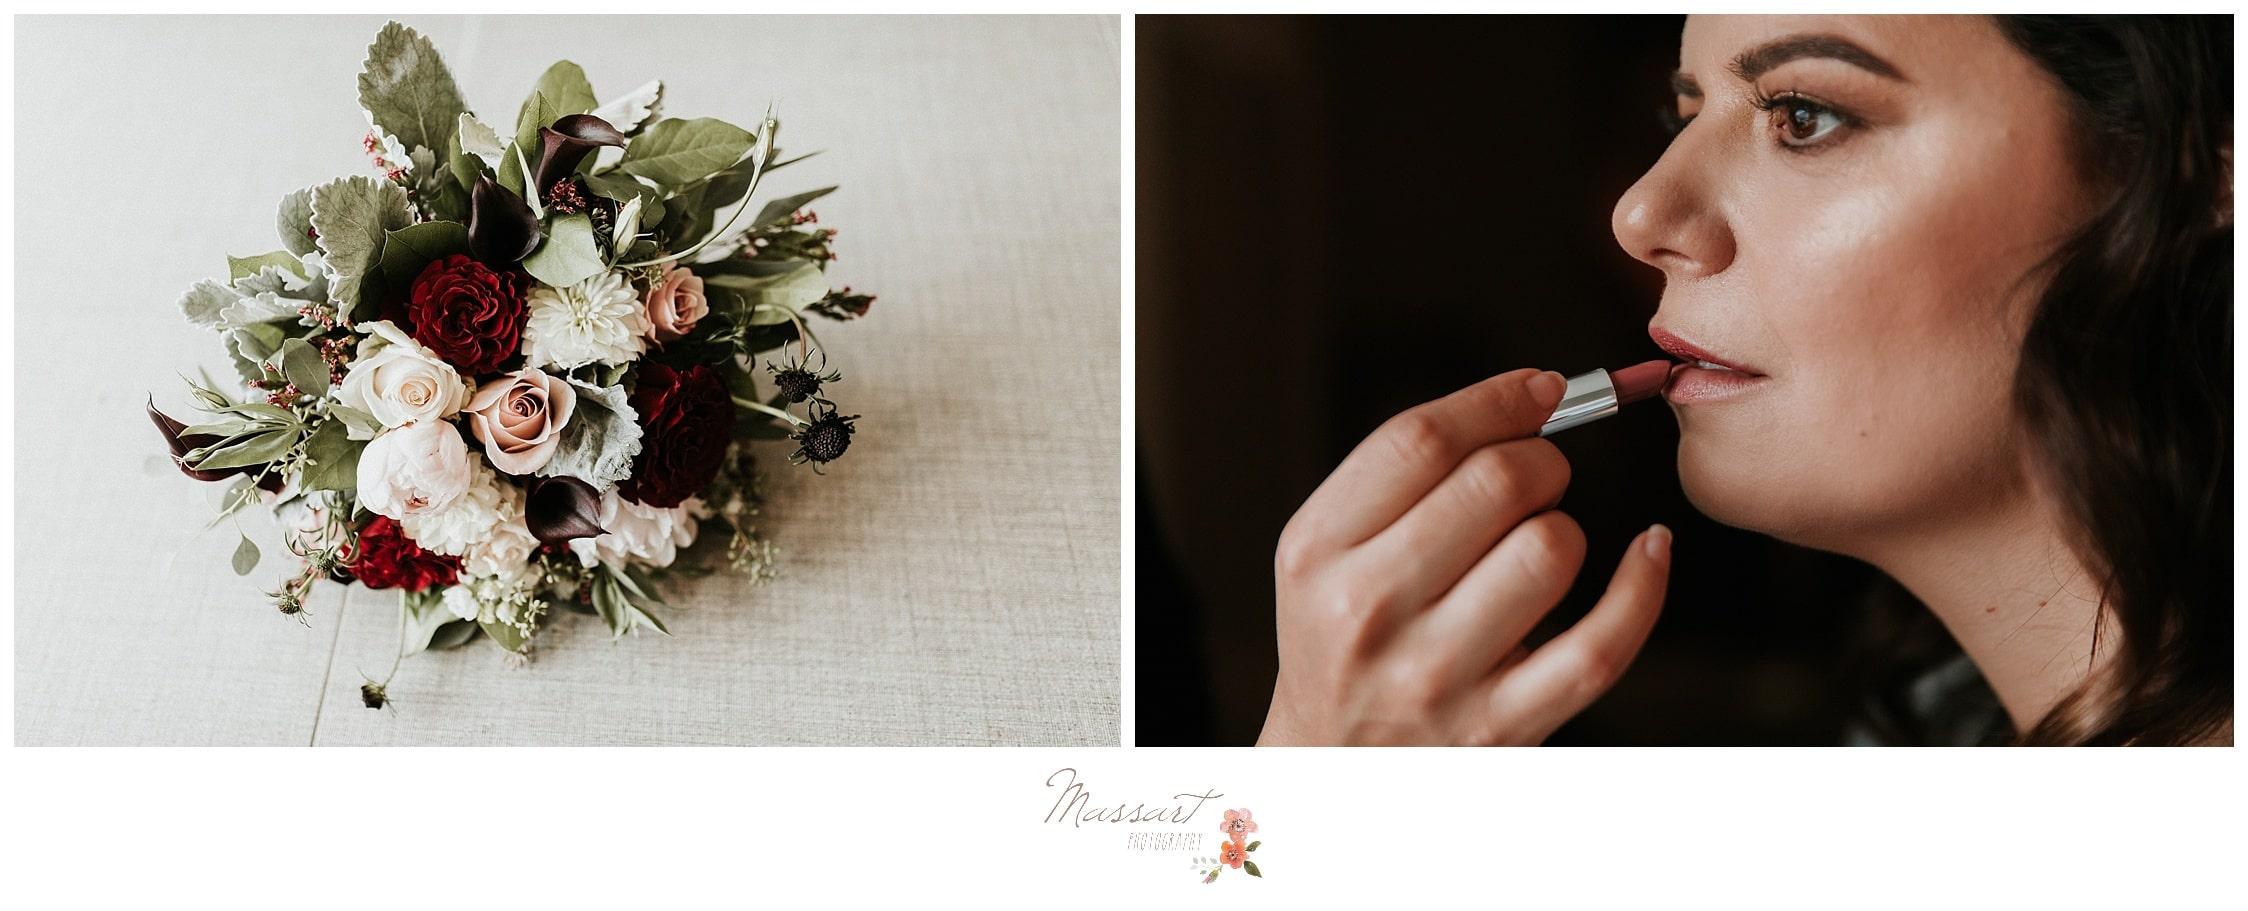 Wedding flowers at the atlantic resort in RI captured by massart photographers